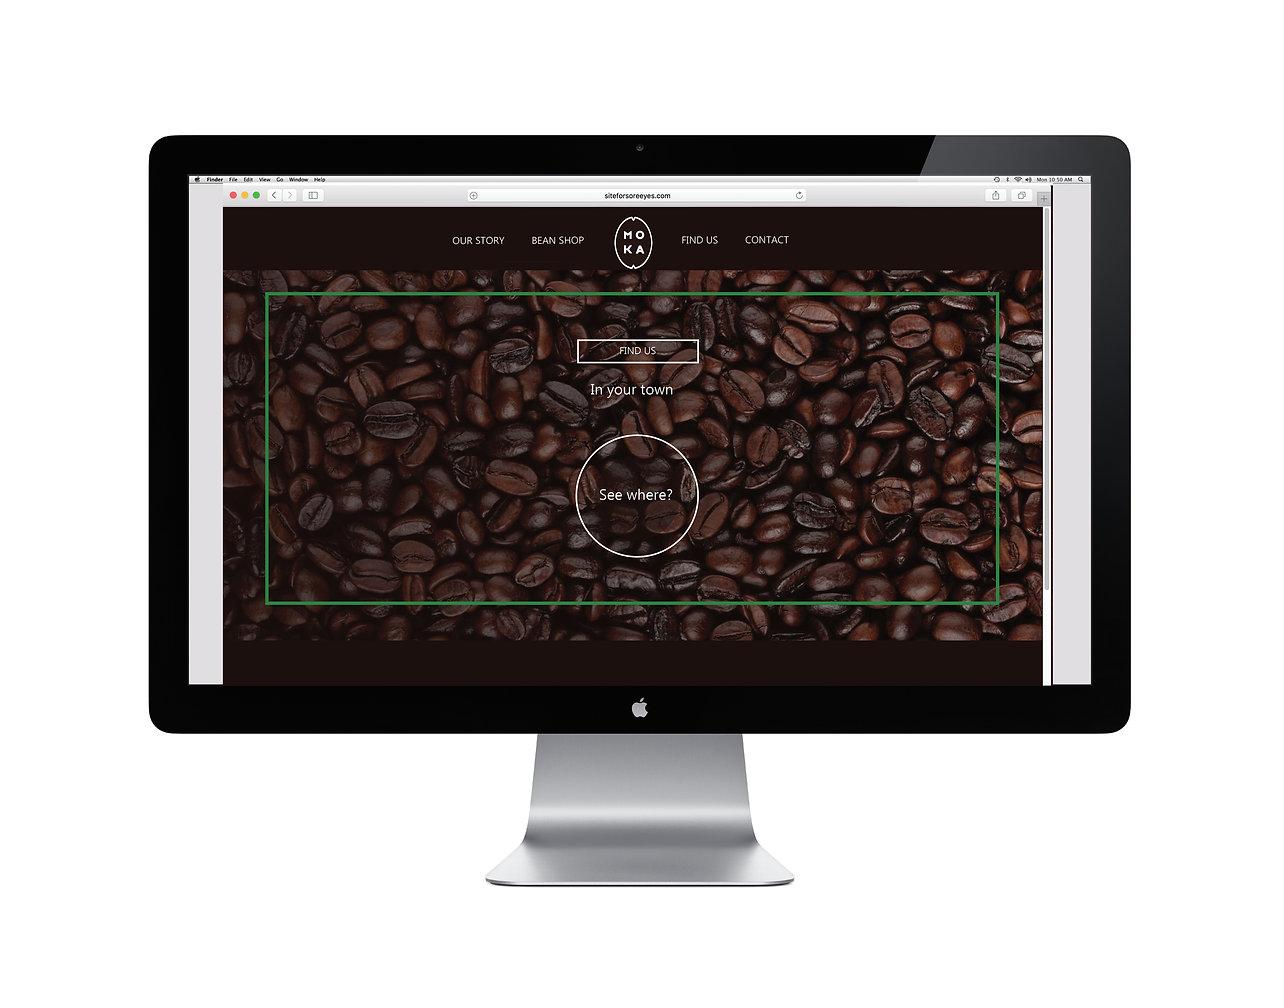 desktop wbe5.jpg